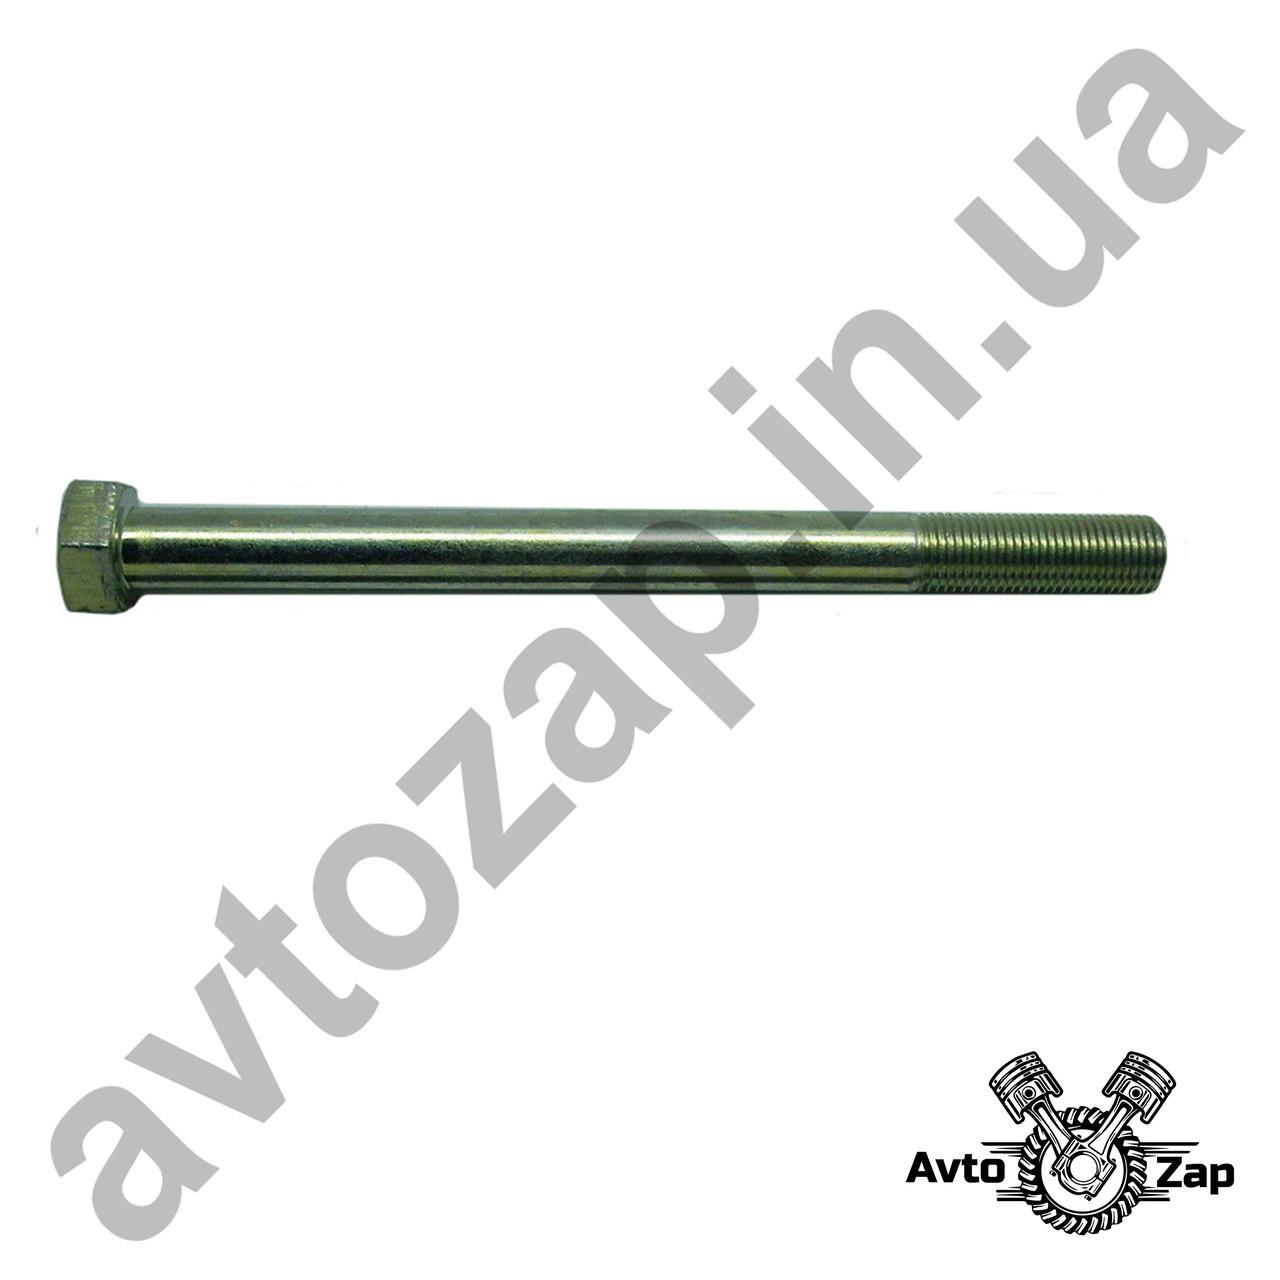 Болт  М12х140  амортизатора заднего  ВАЗ 2101-07 (5 шт.)п/э уп.    35840